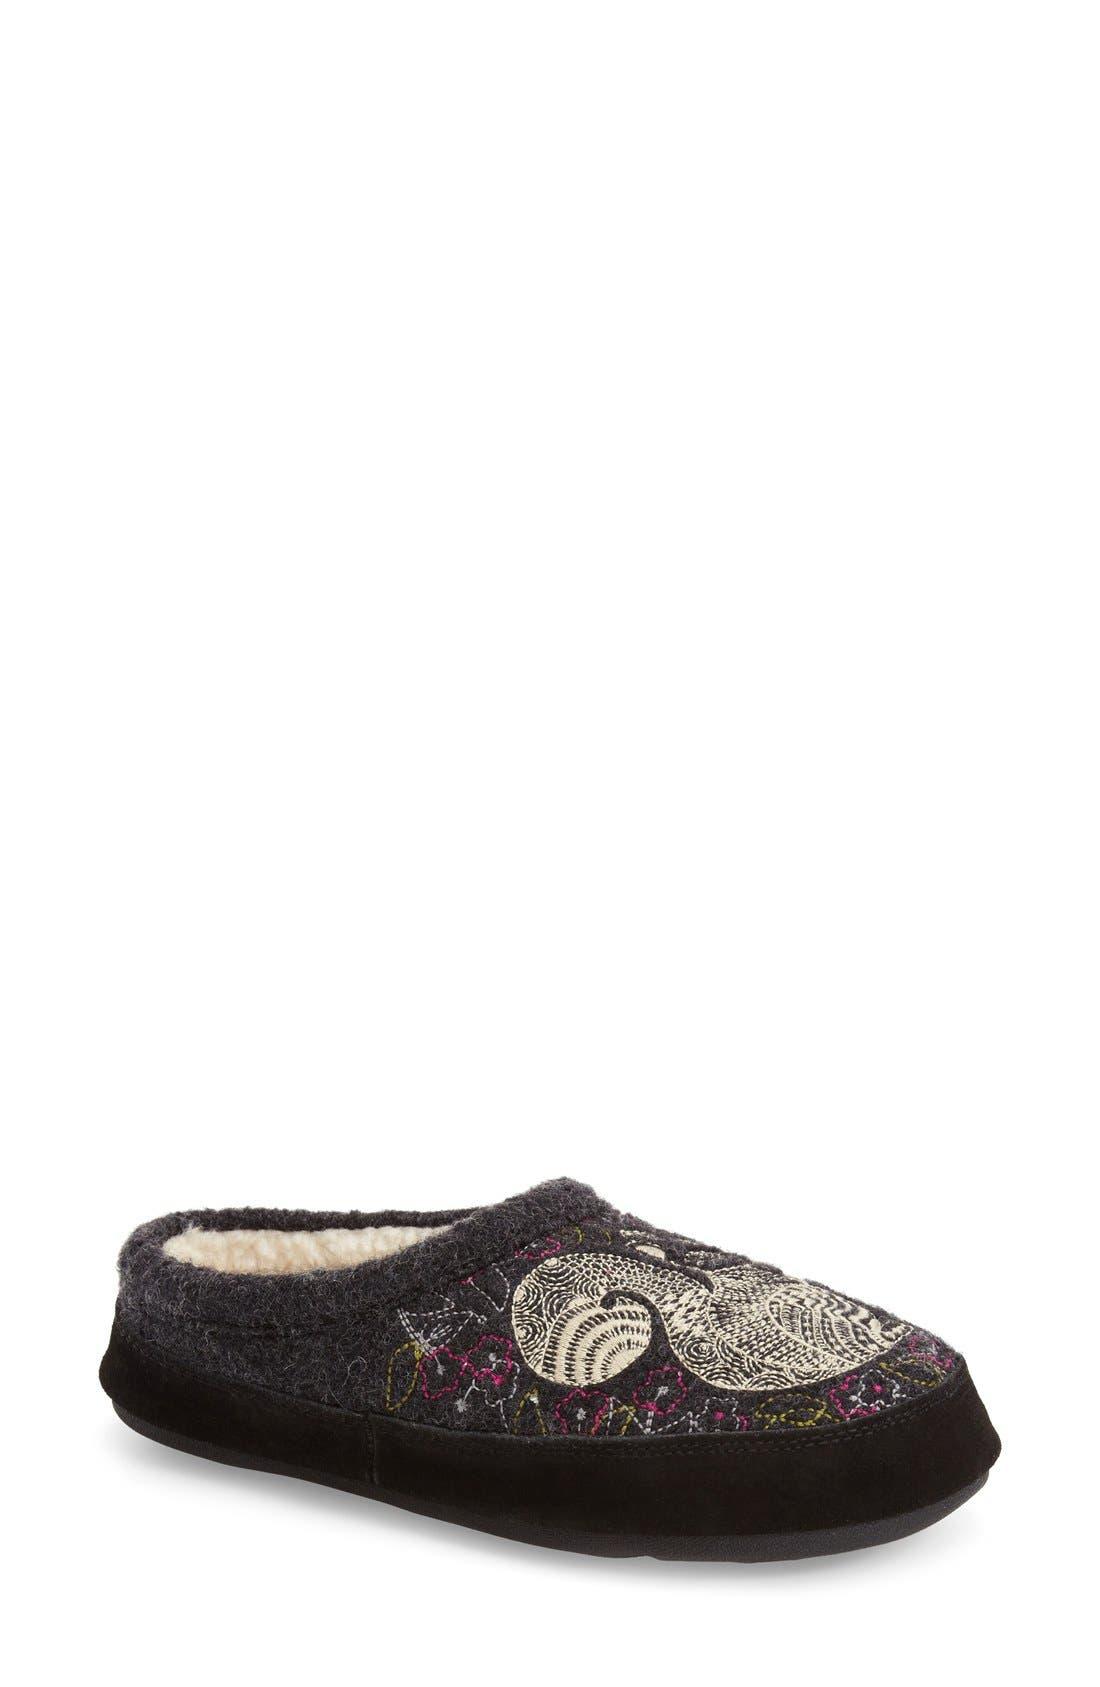 ACORN 'Forest' Wool Mule Slipper, Main, color, GREY SQUIRREL